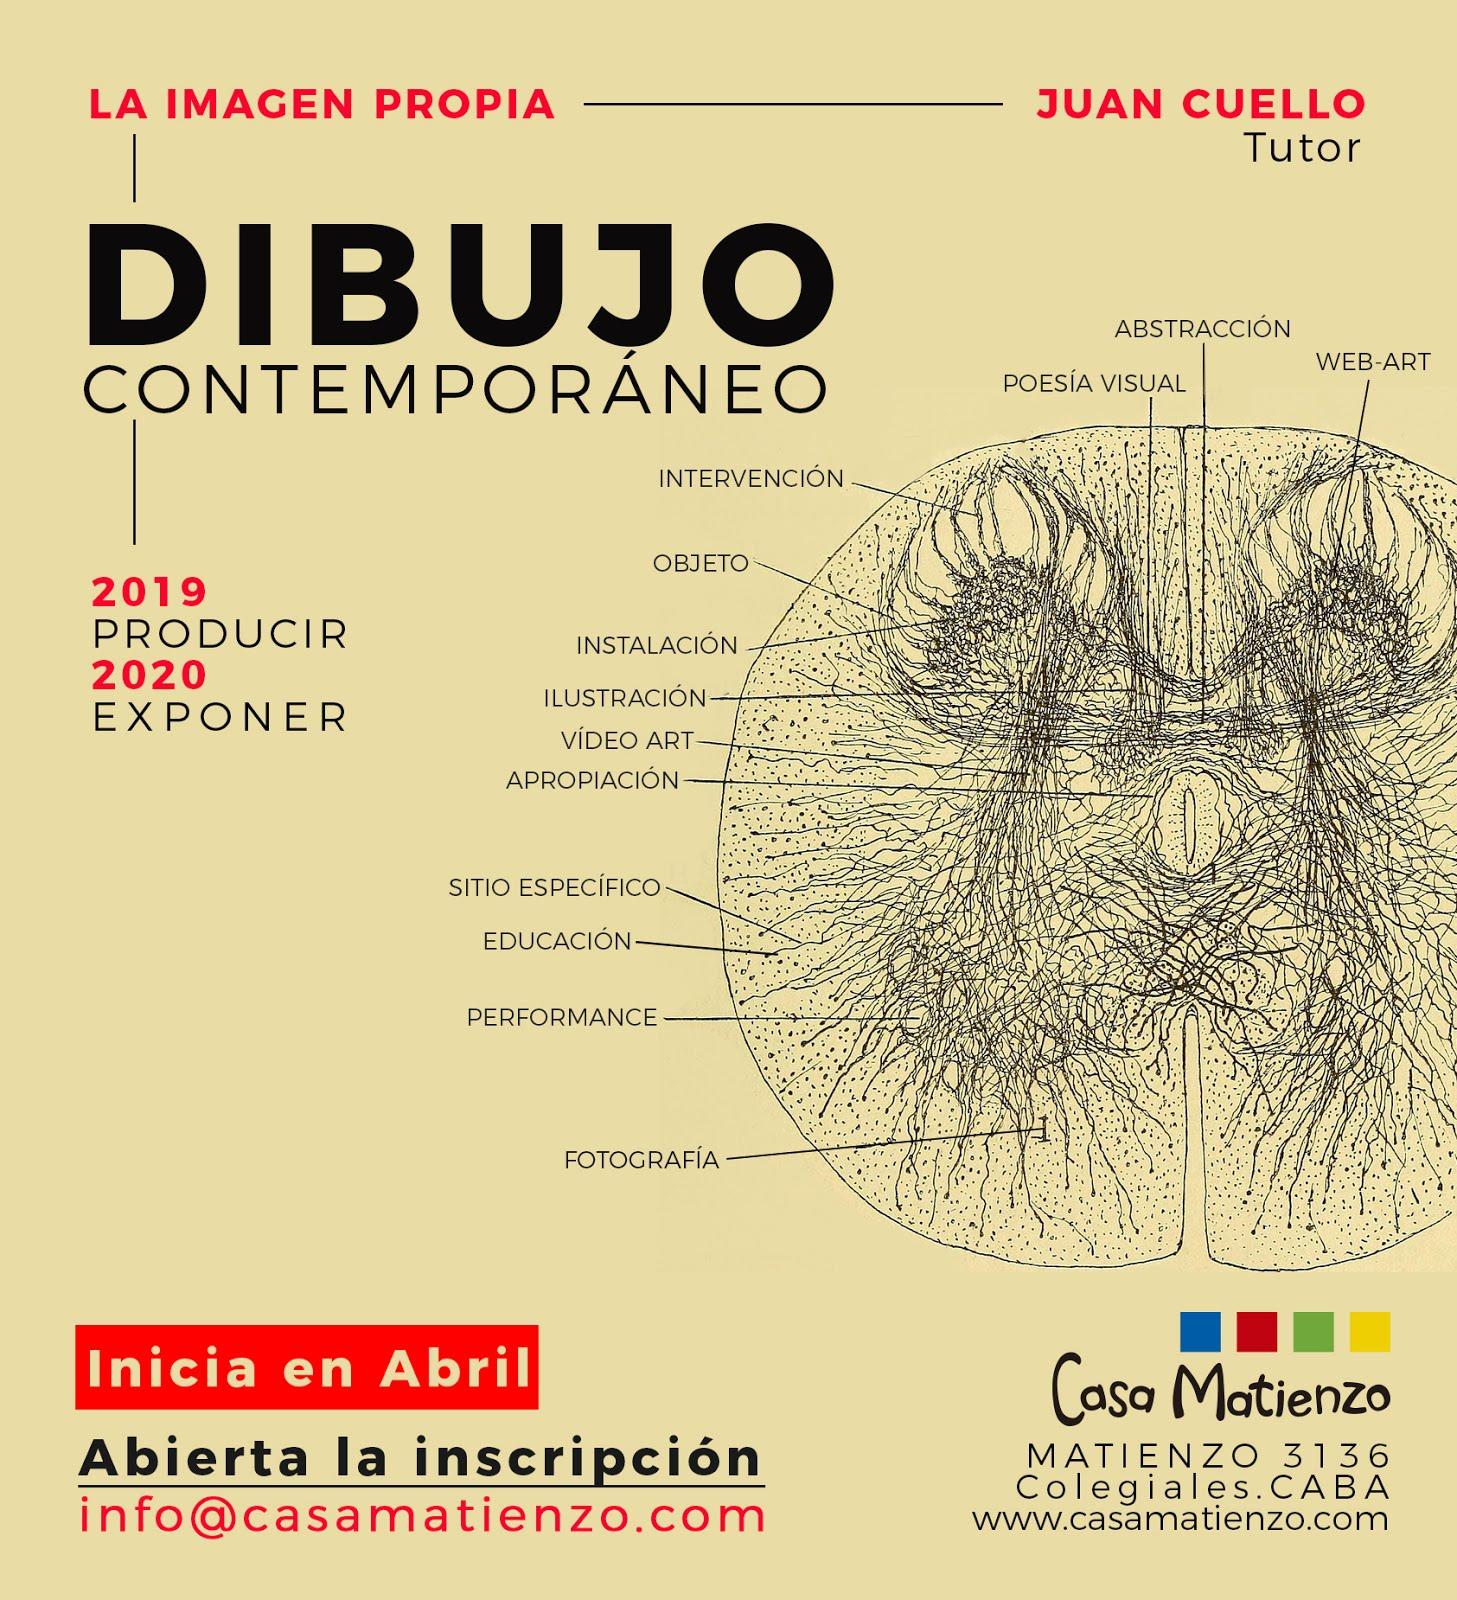 ABRIL: Inicia Taller La Imagen Propia 2019/Exponer 2020. Dibujo contemporáne A cargo de Juan Cuello